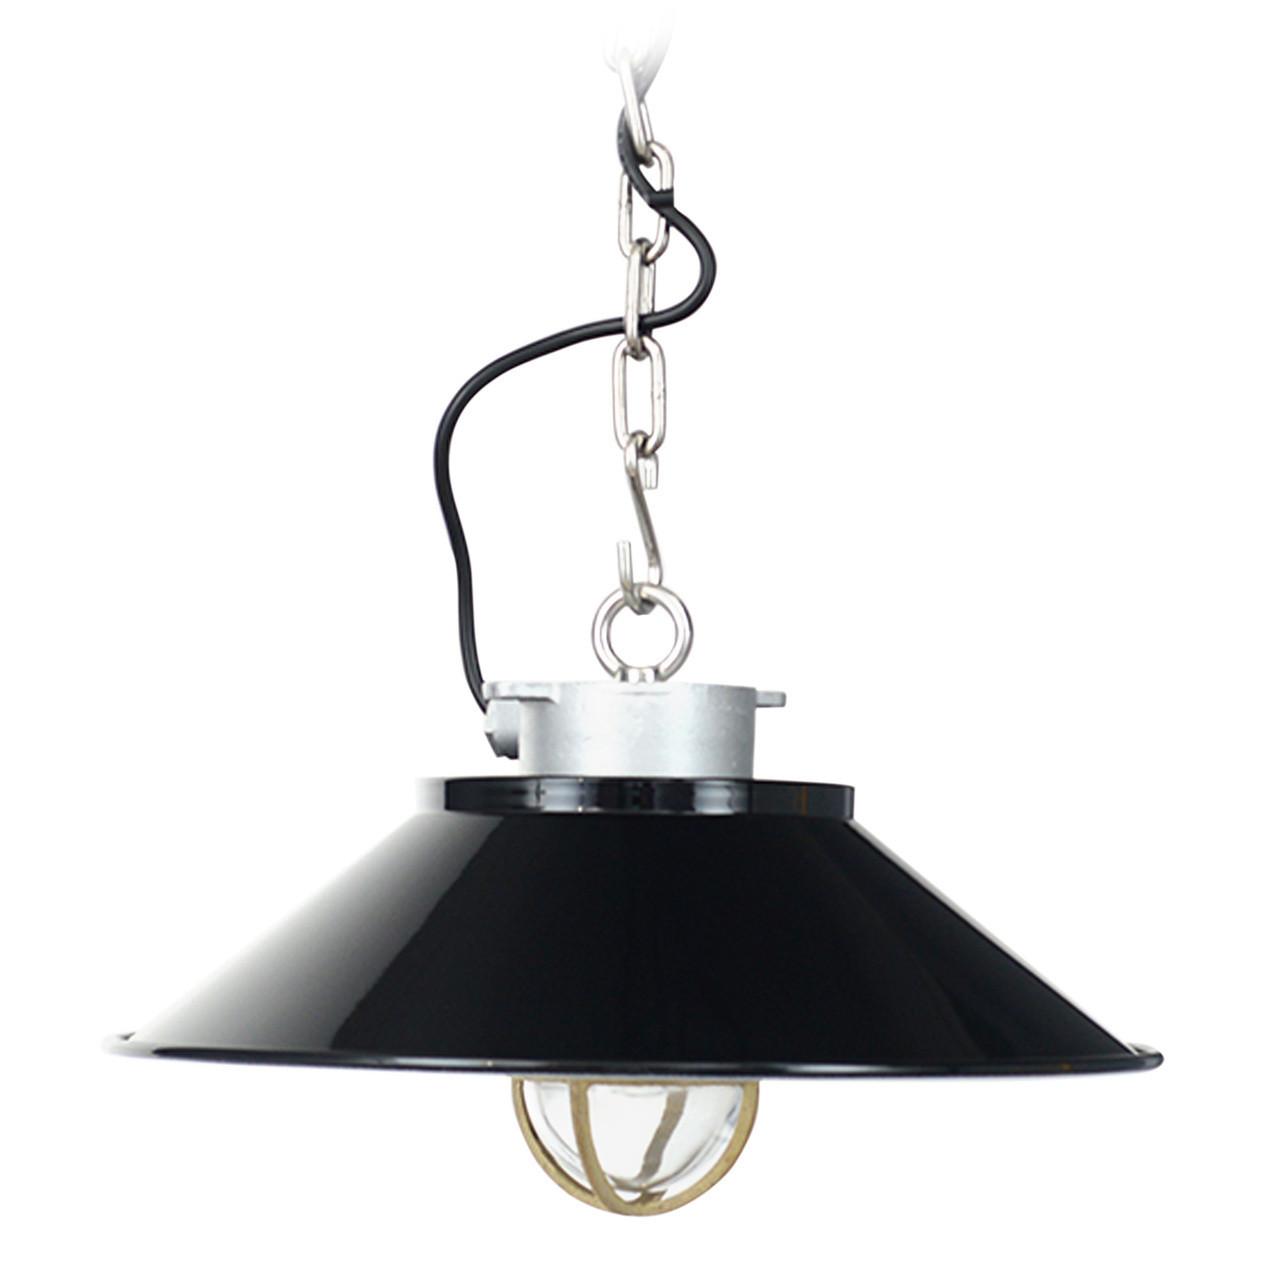 Devonport Nautical Pendant Light Black Cocoweb Quality Led Lighting Specialists